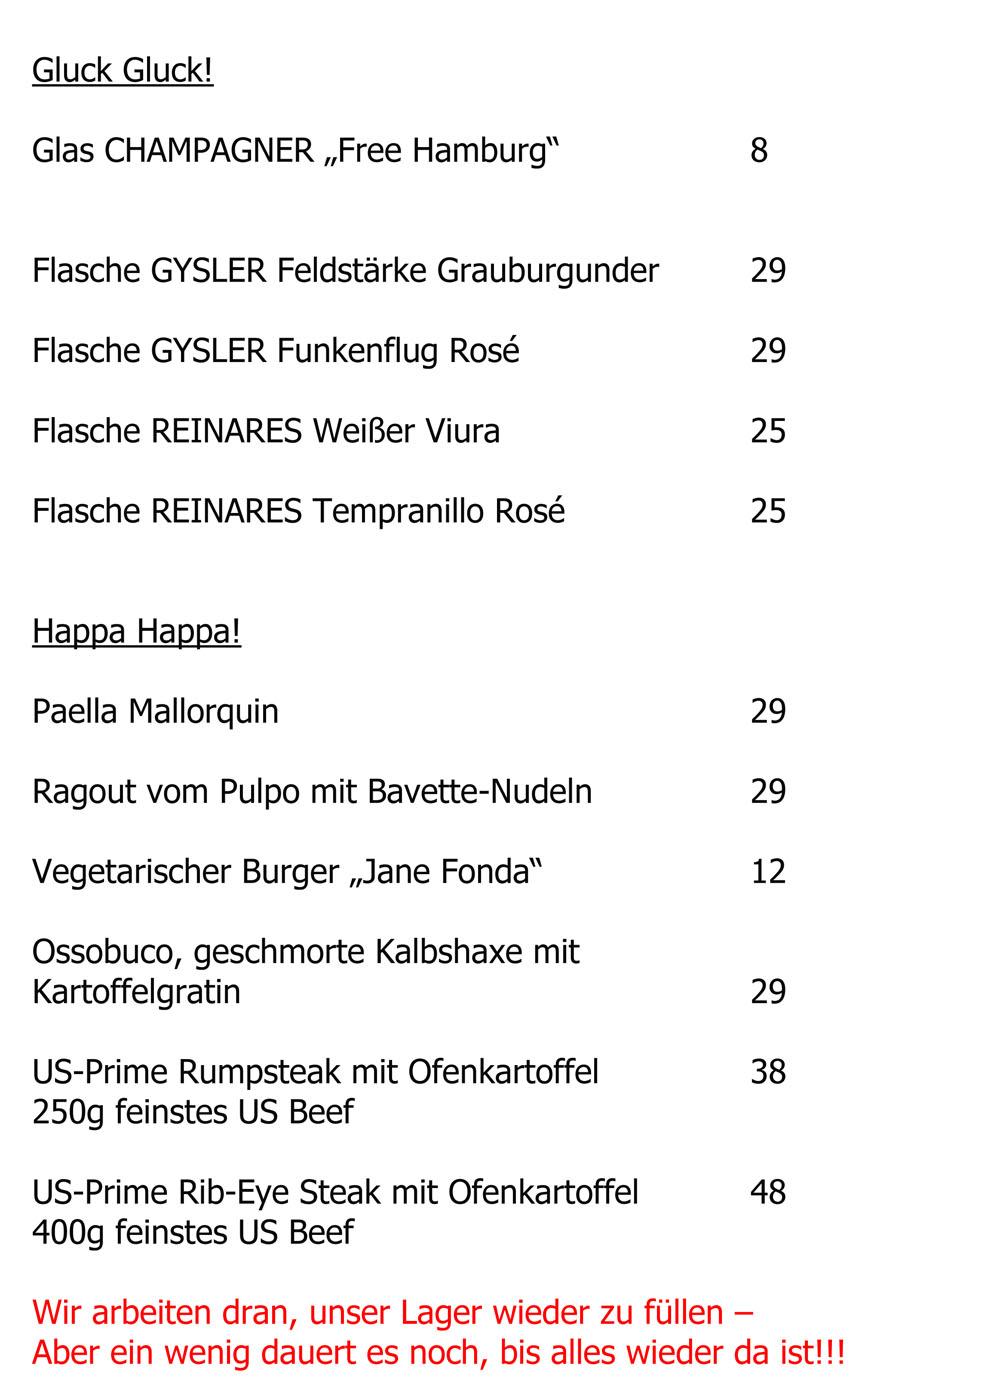 Speisenkarte - Lehmitz Weinstuben